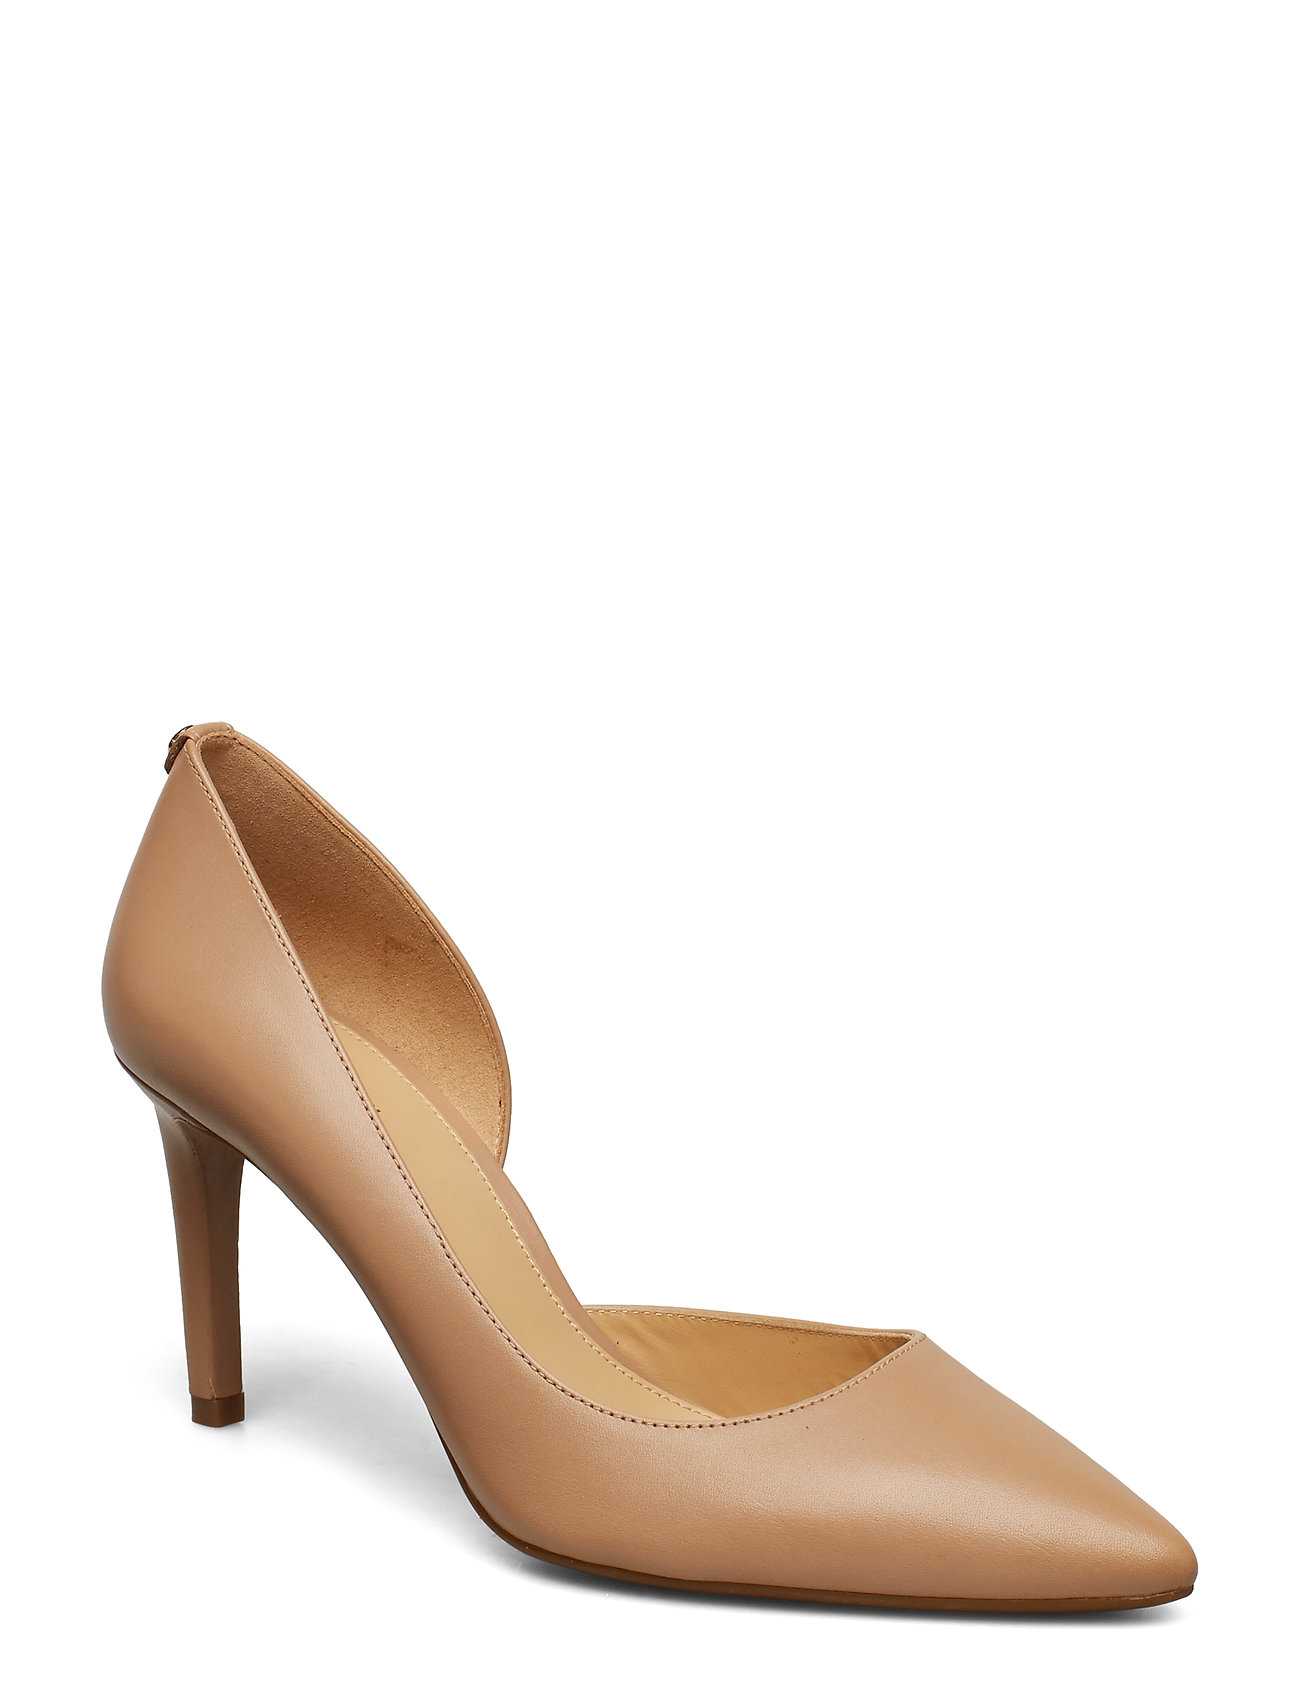 Michael Kors Shoes DOROTHY FLEX D'ORSAY - SAHARA